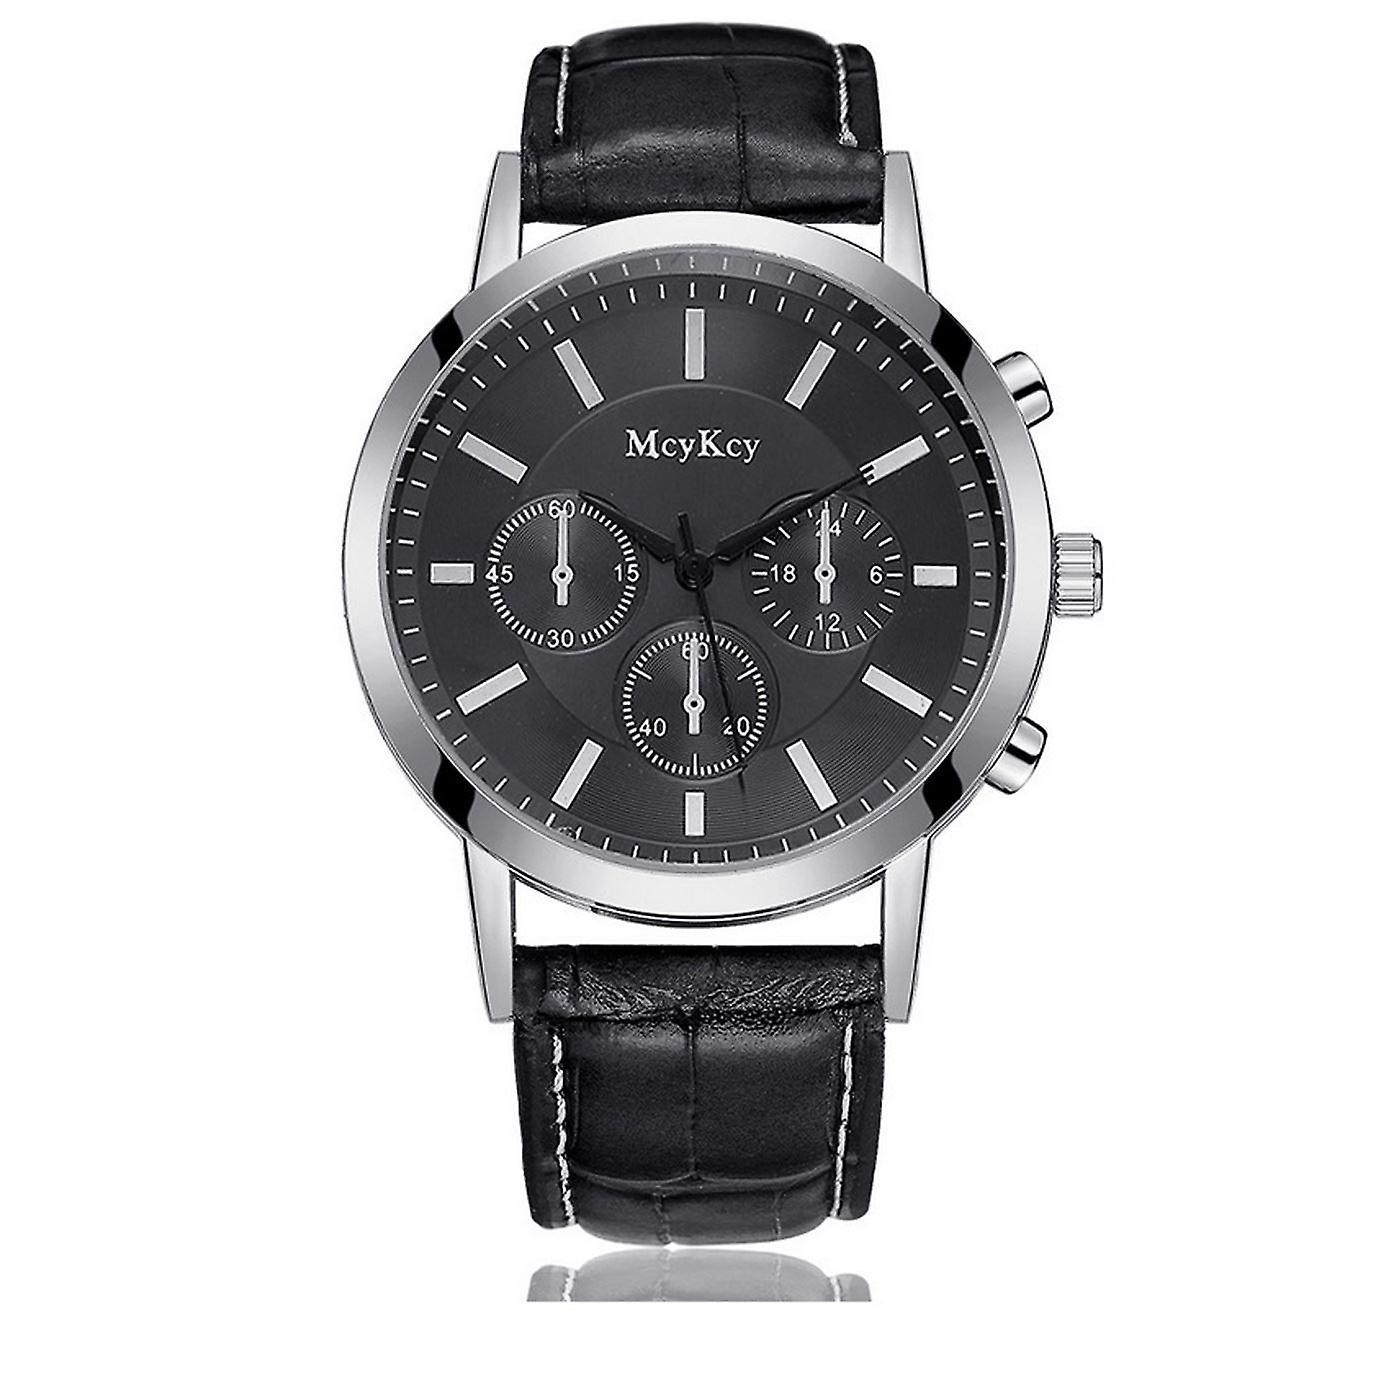 Luxury Silver Chrono Watch Called Elegant Time